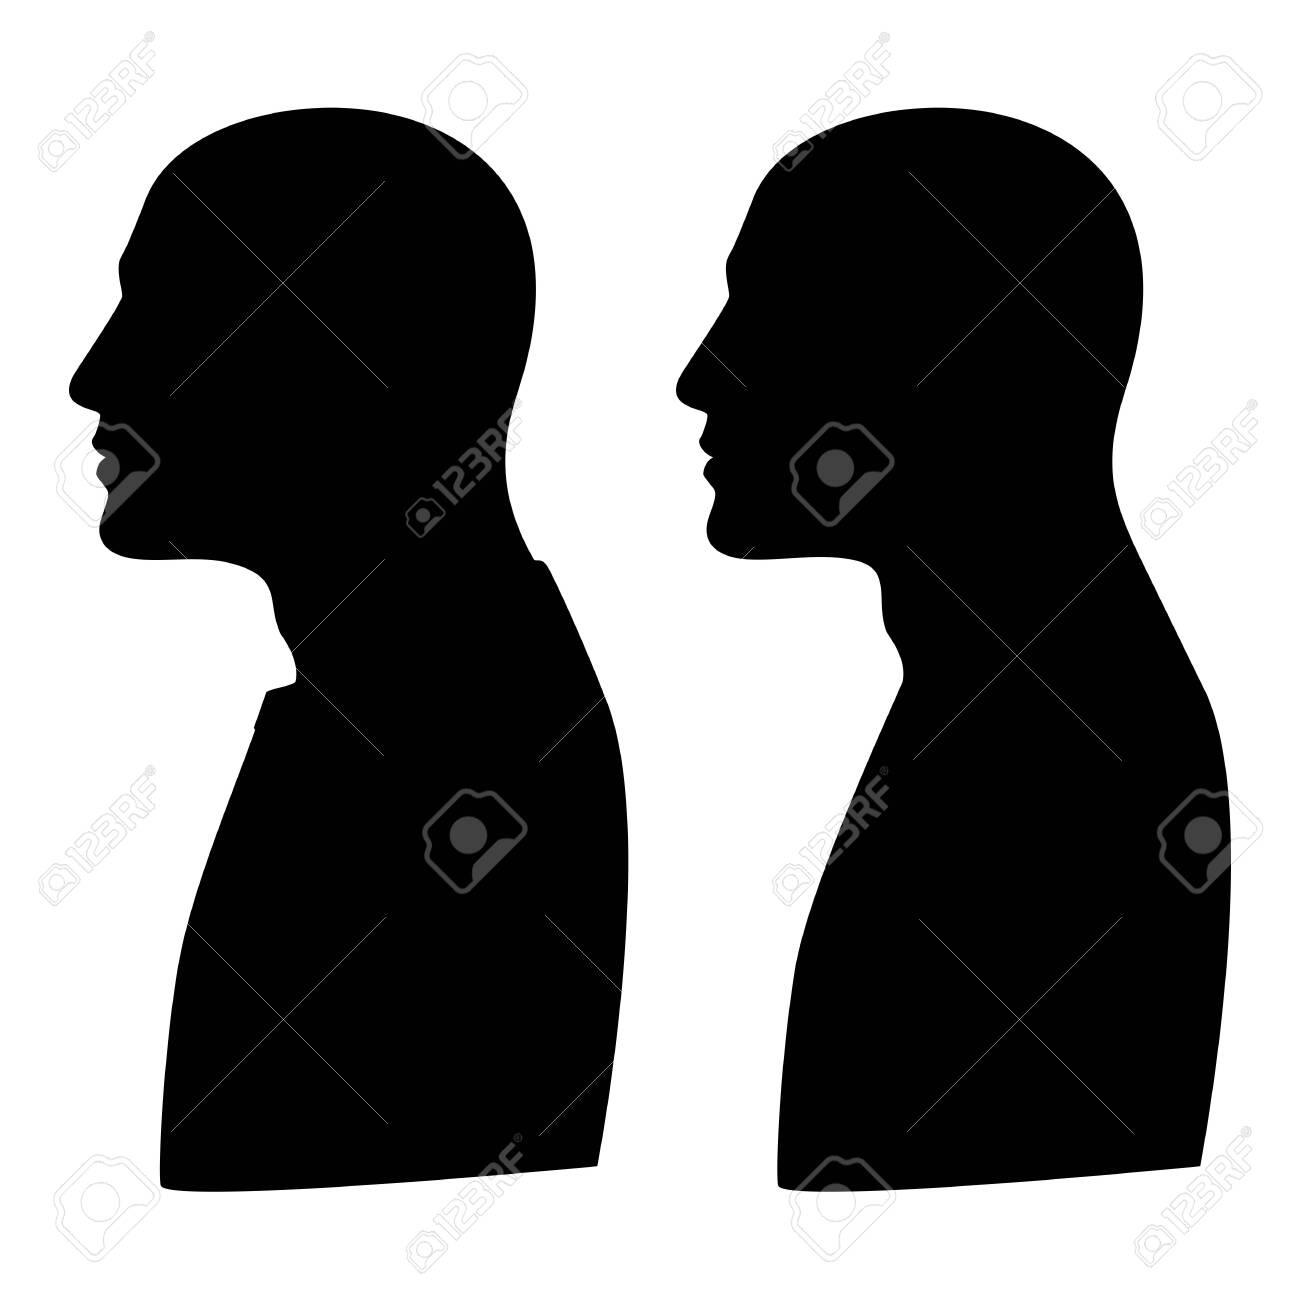 Mockup, template silhouette profile portrait of a man. Sign. illustration - 158311539